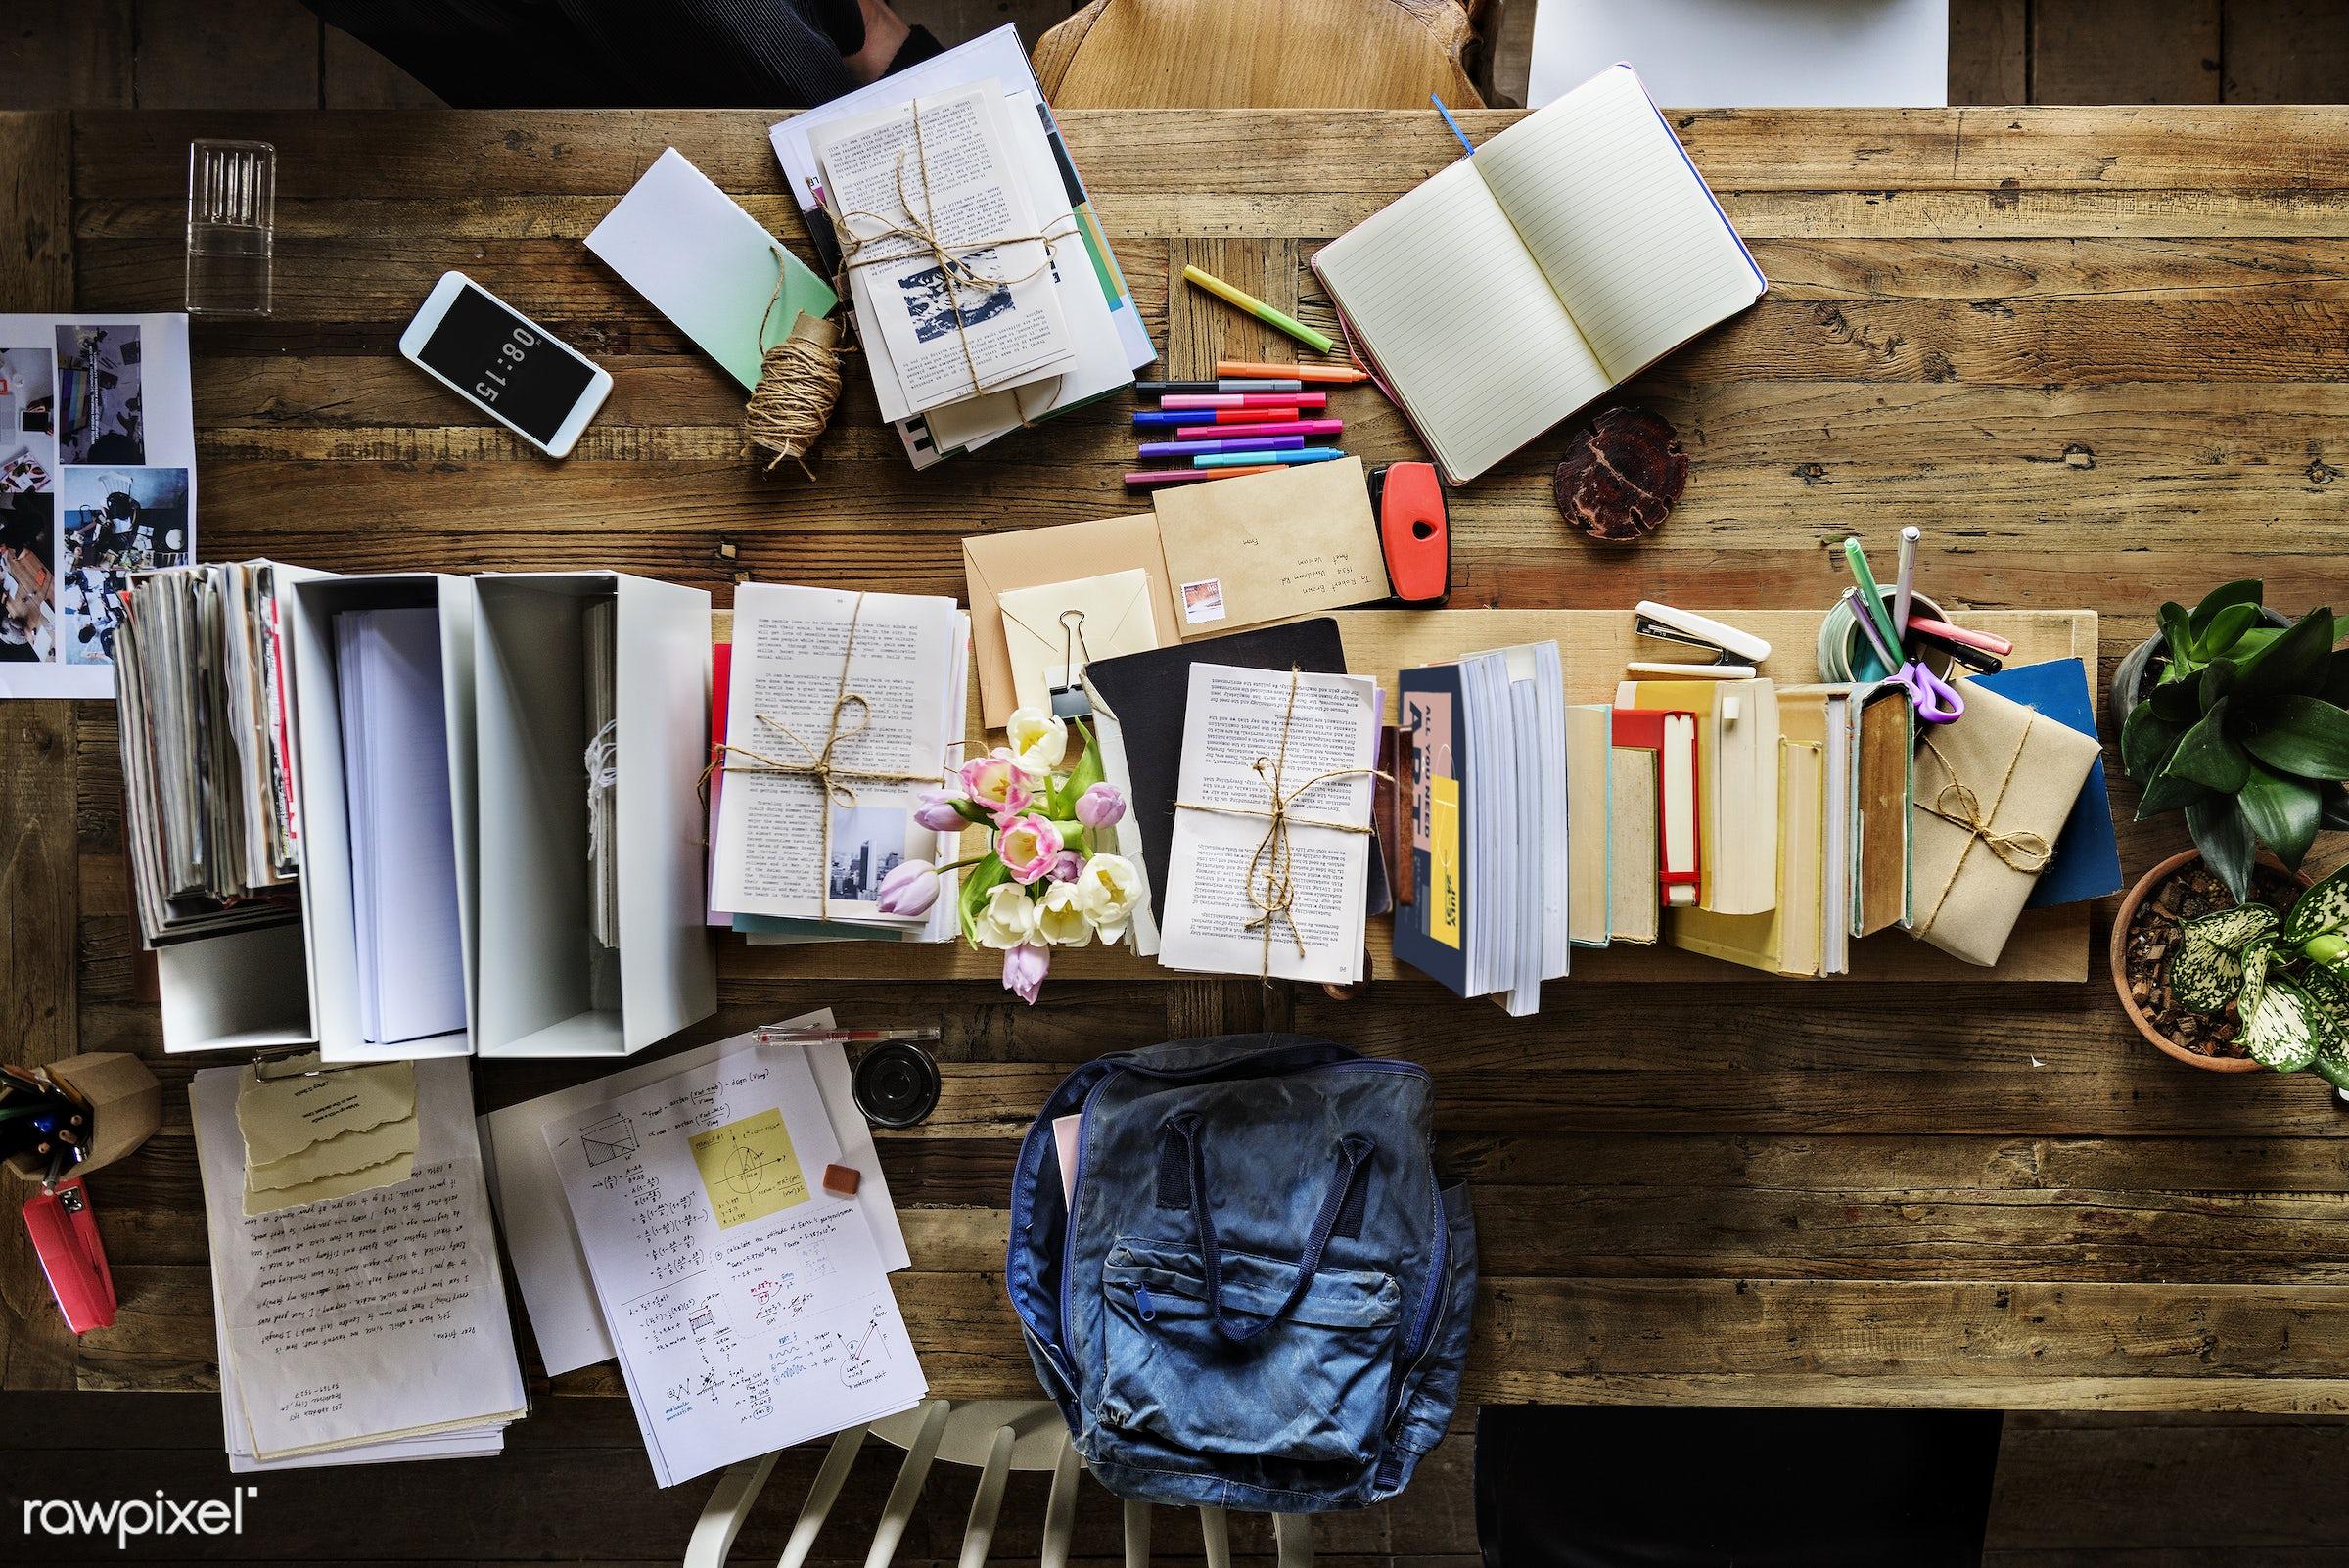 progress, knowledge, development, college, wisdom, perceptive, insight, understanding, study, education, science, student,...